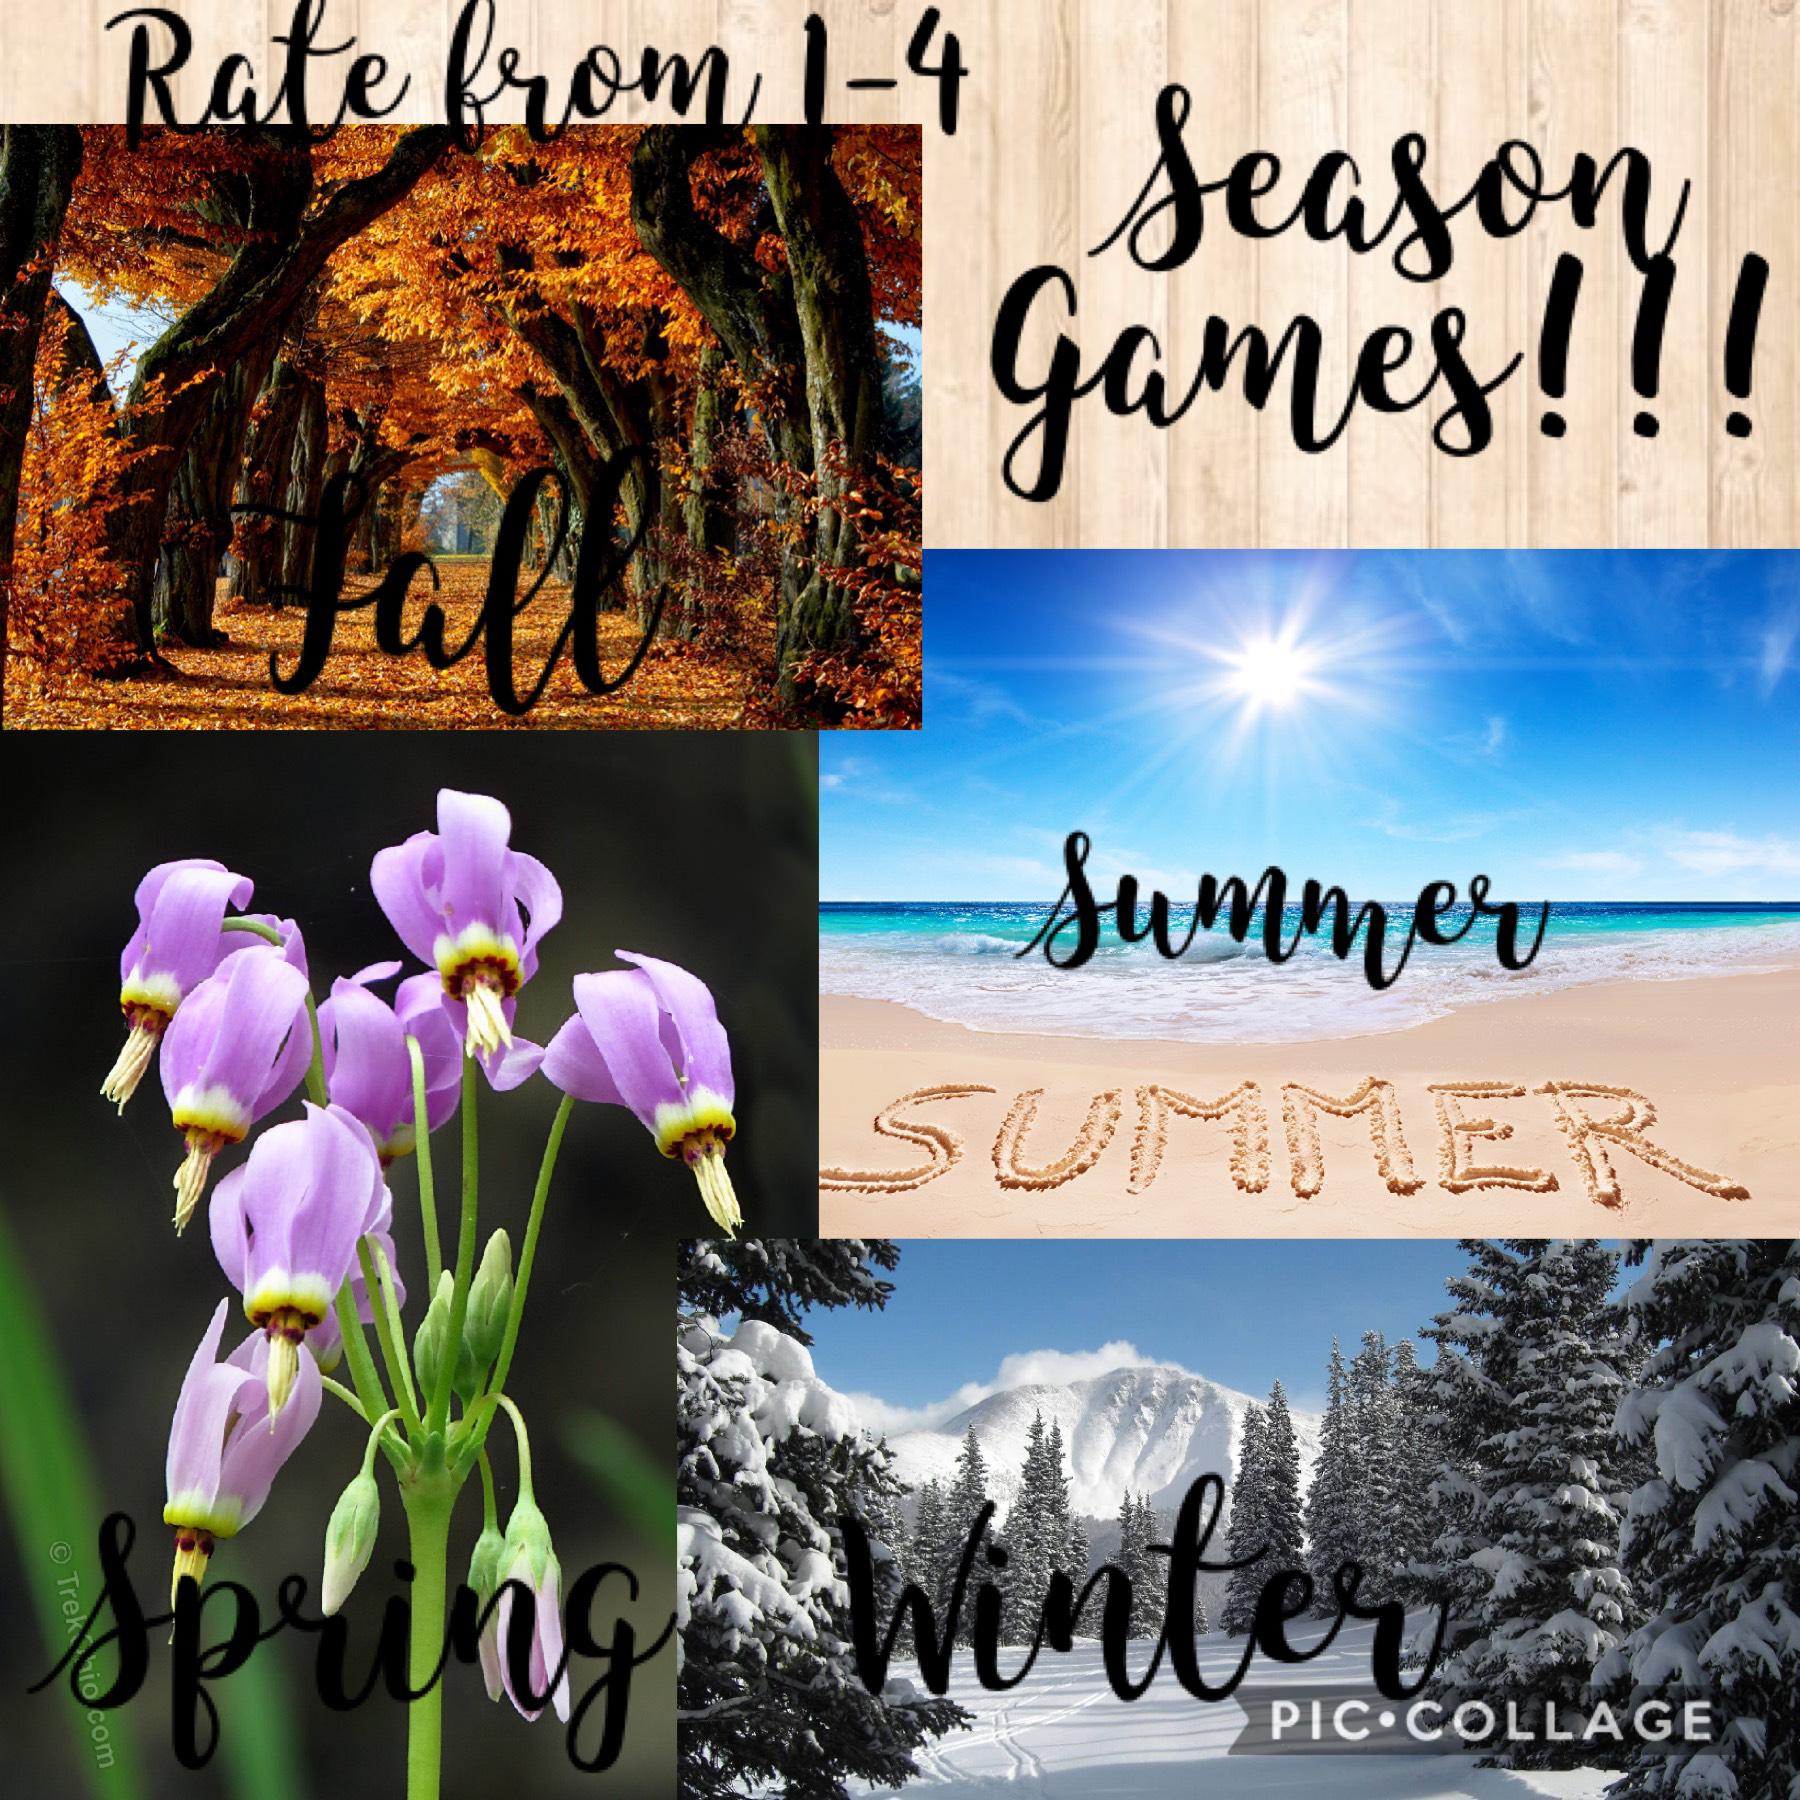 Season games! Please join!!